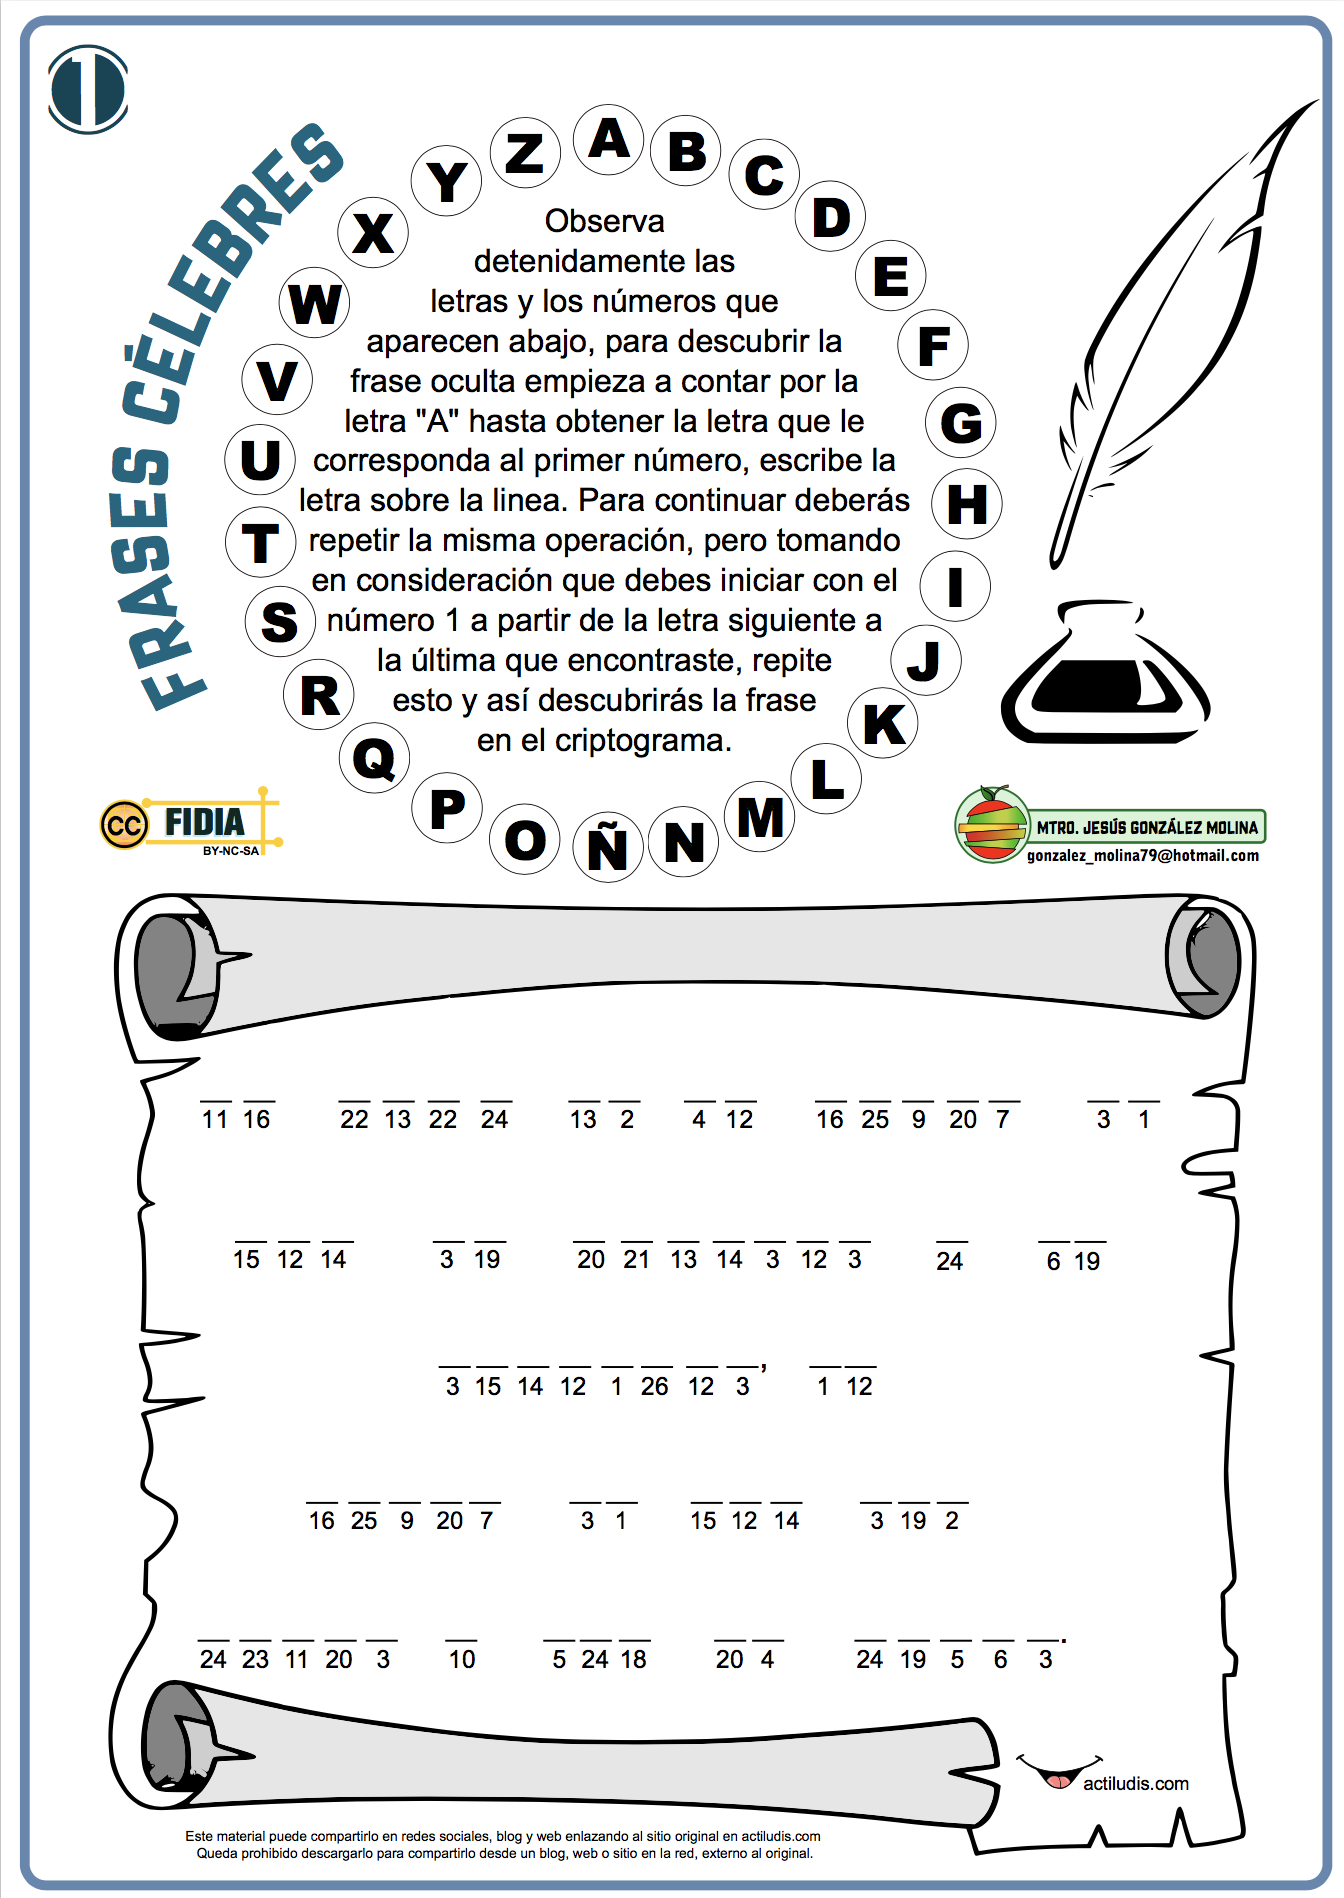 Criptograma Frases Celebres